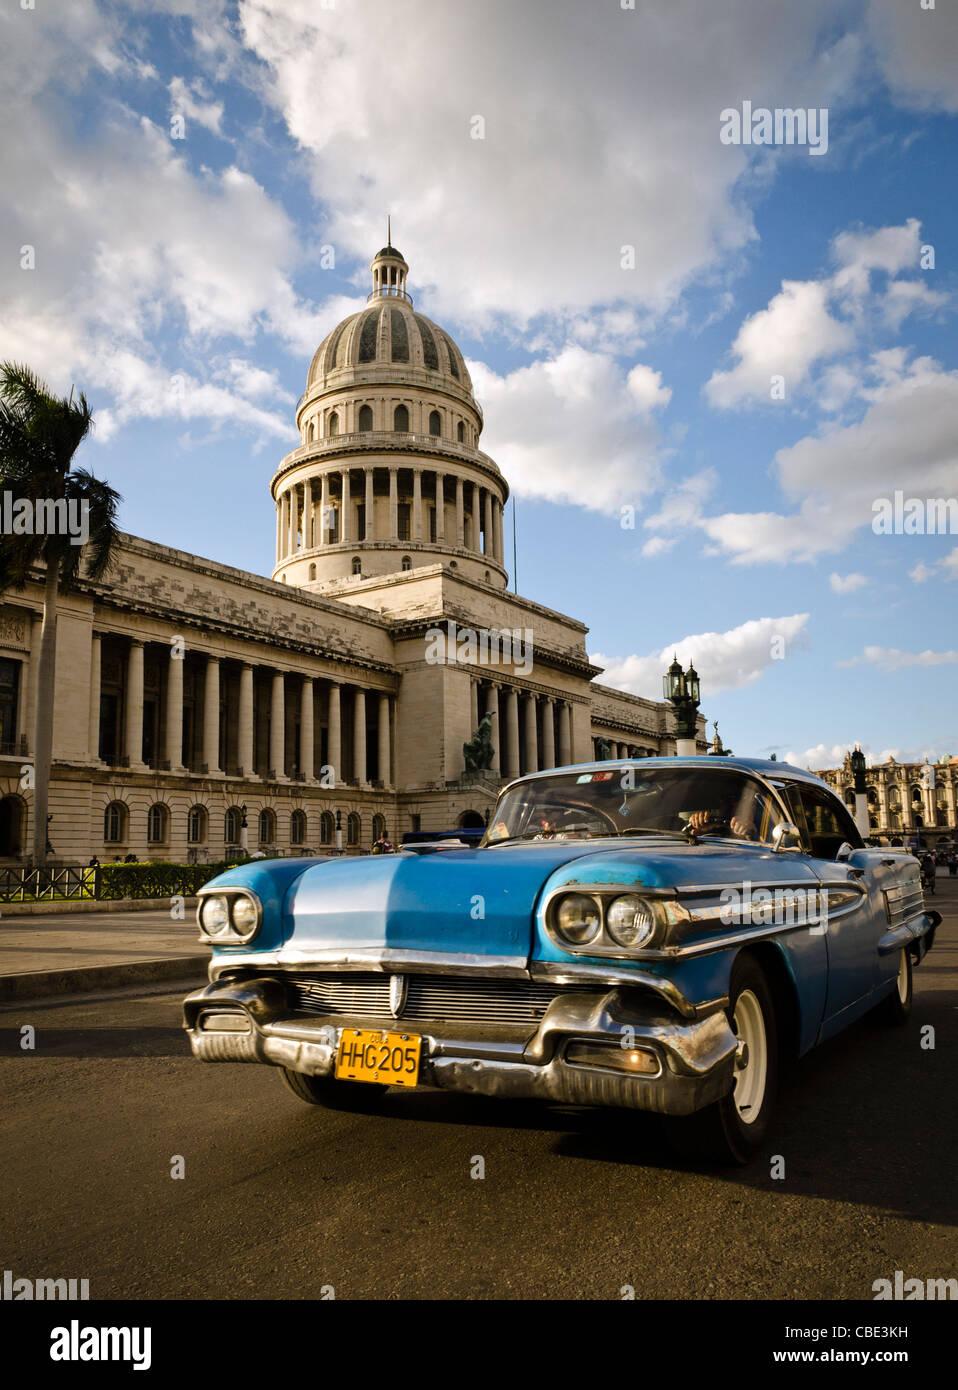 Amerikanische Oldtimer vor El Capitolio Havanna Kuba Stockbild